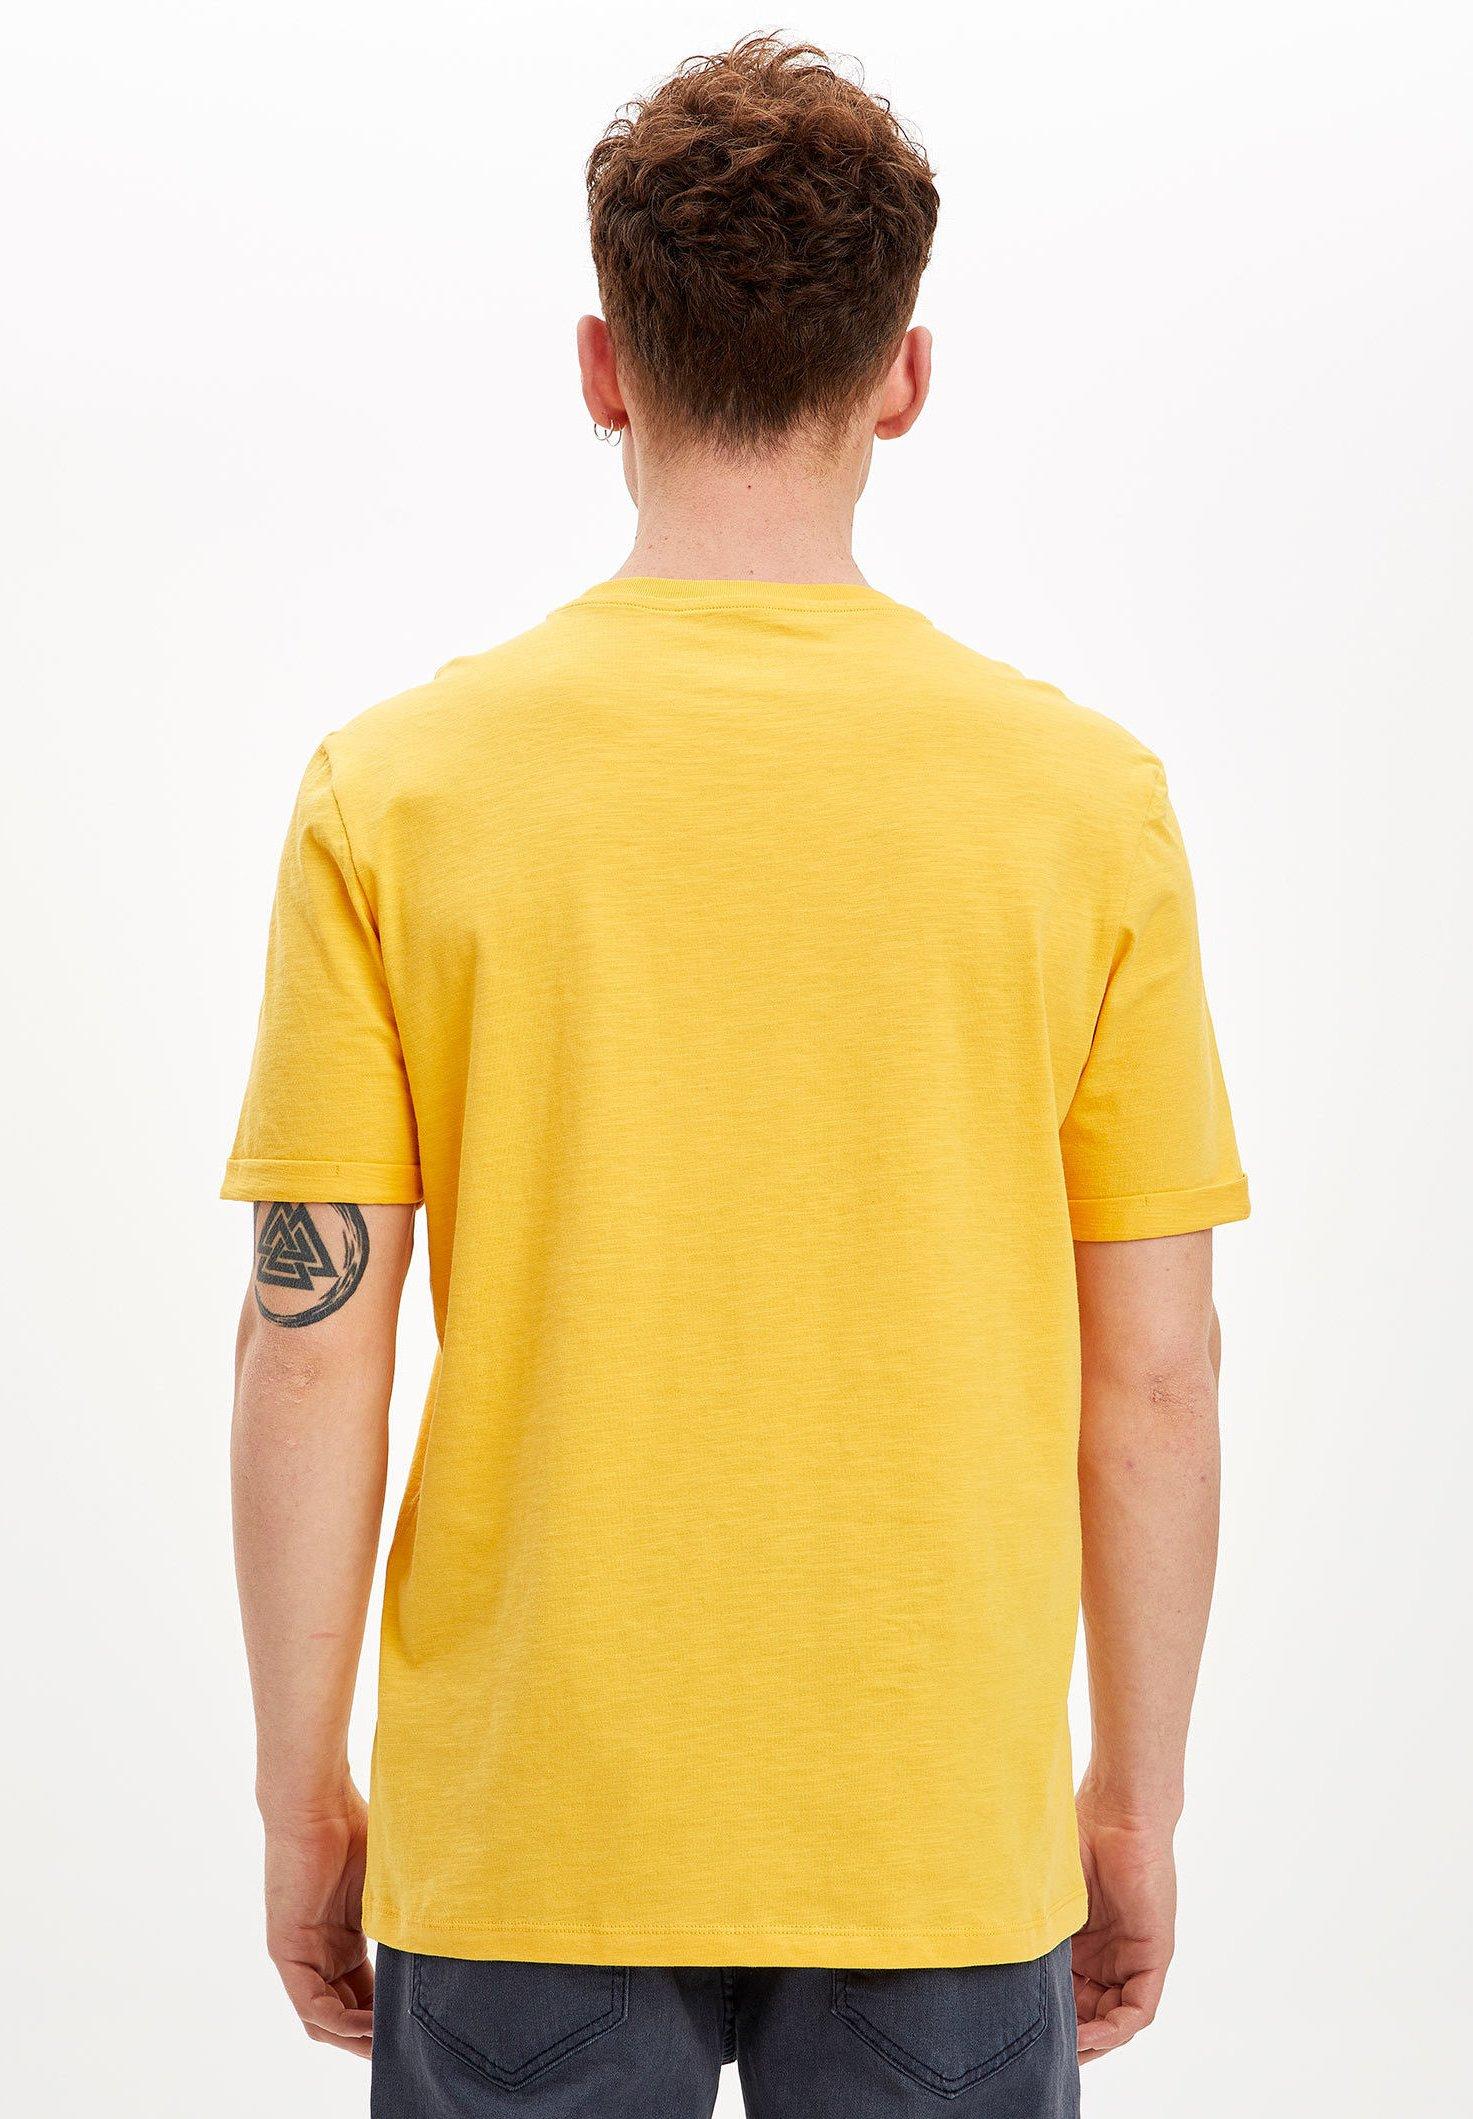 DeFacto Basic T-shirt - yellow wPRoS